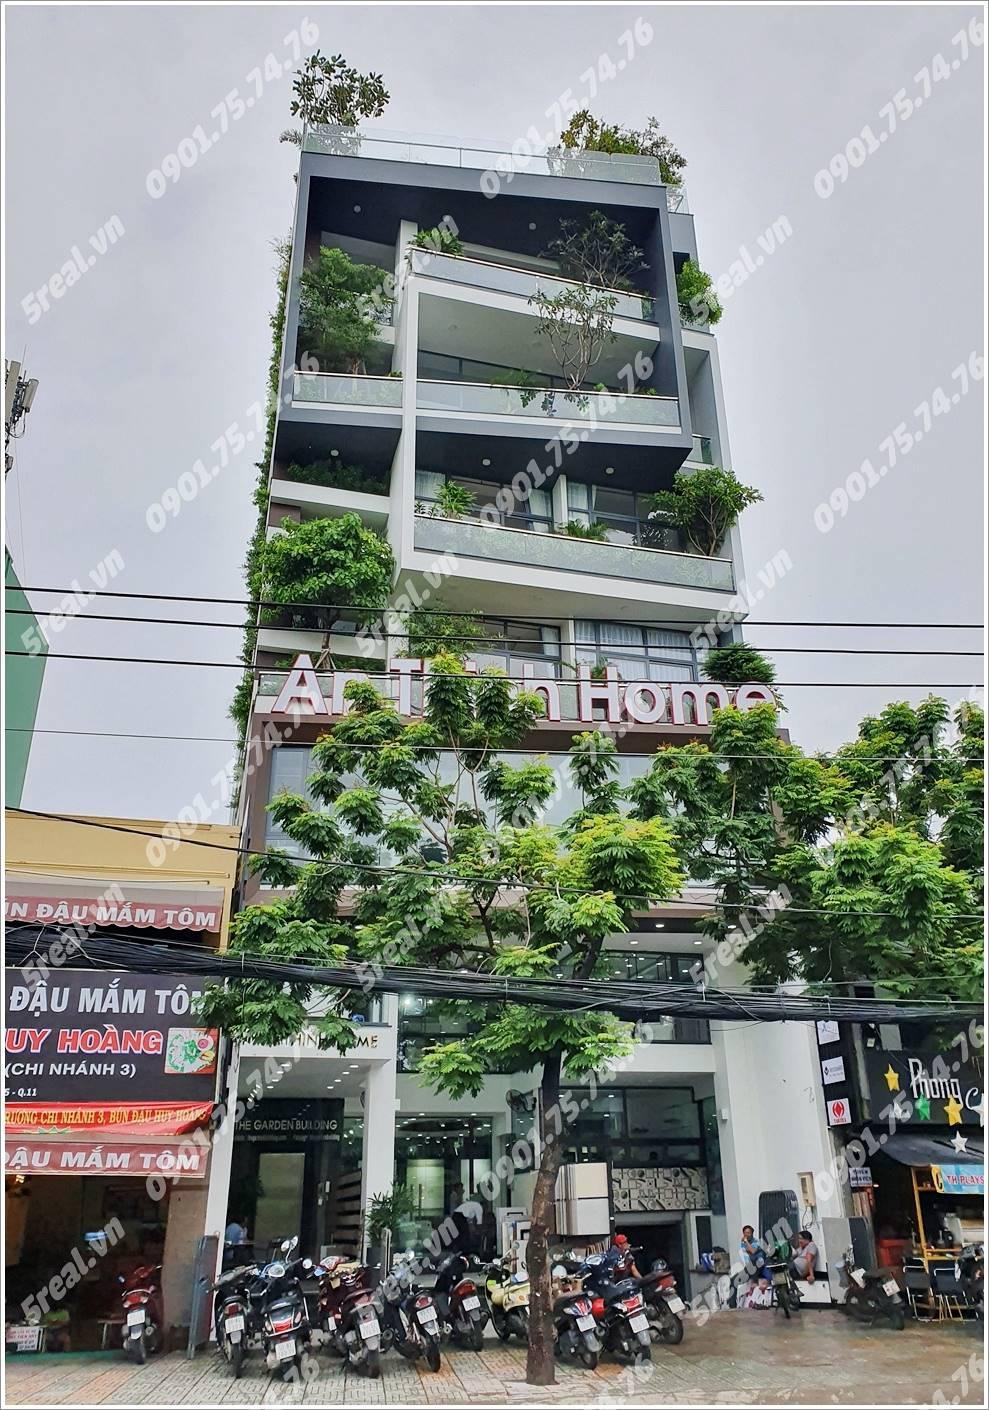 the-garden-building-hoa-binh-quan-11-van-phong-cho-thue-tphcm-5real.vn-01